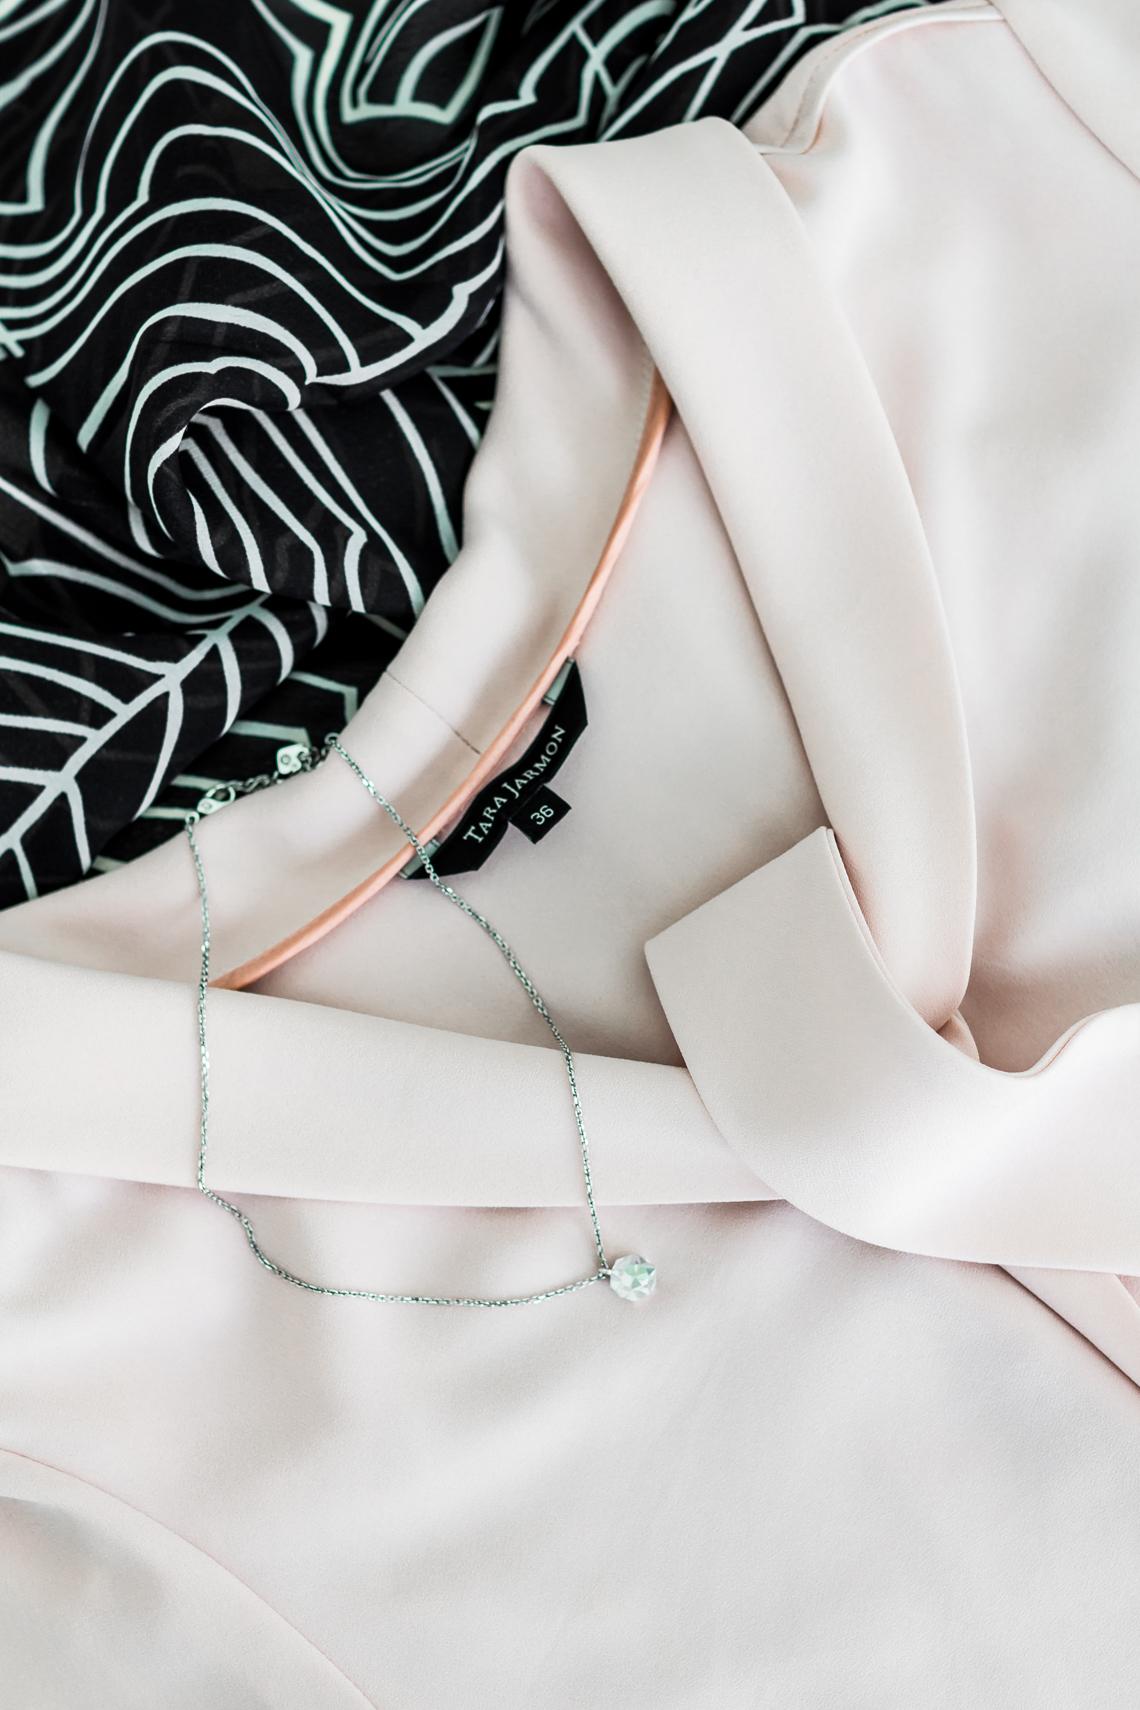 tara-jarmon-blouse-4